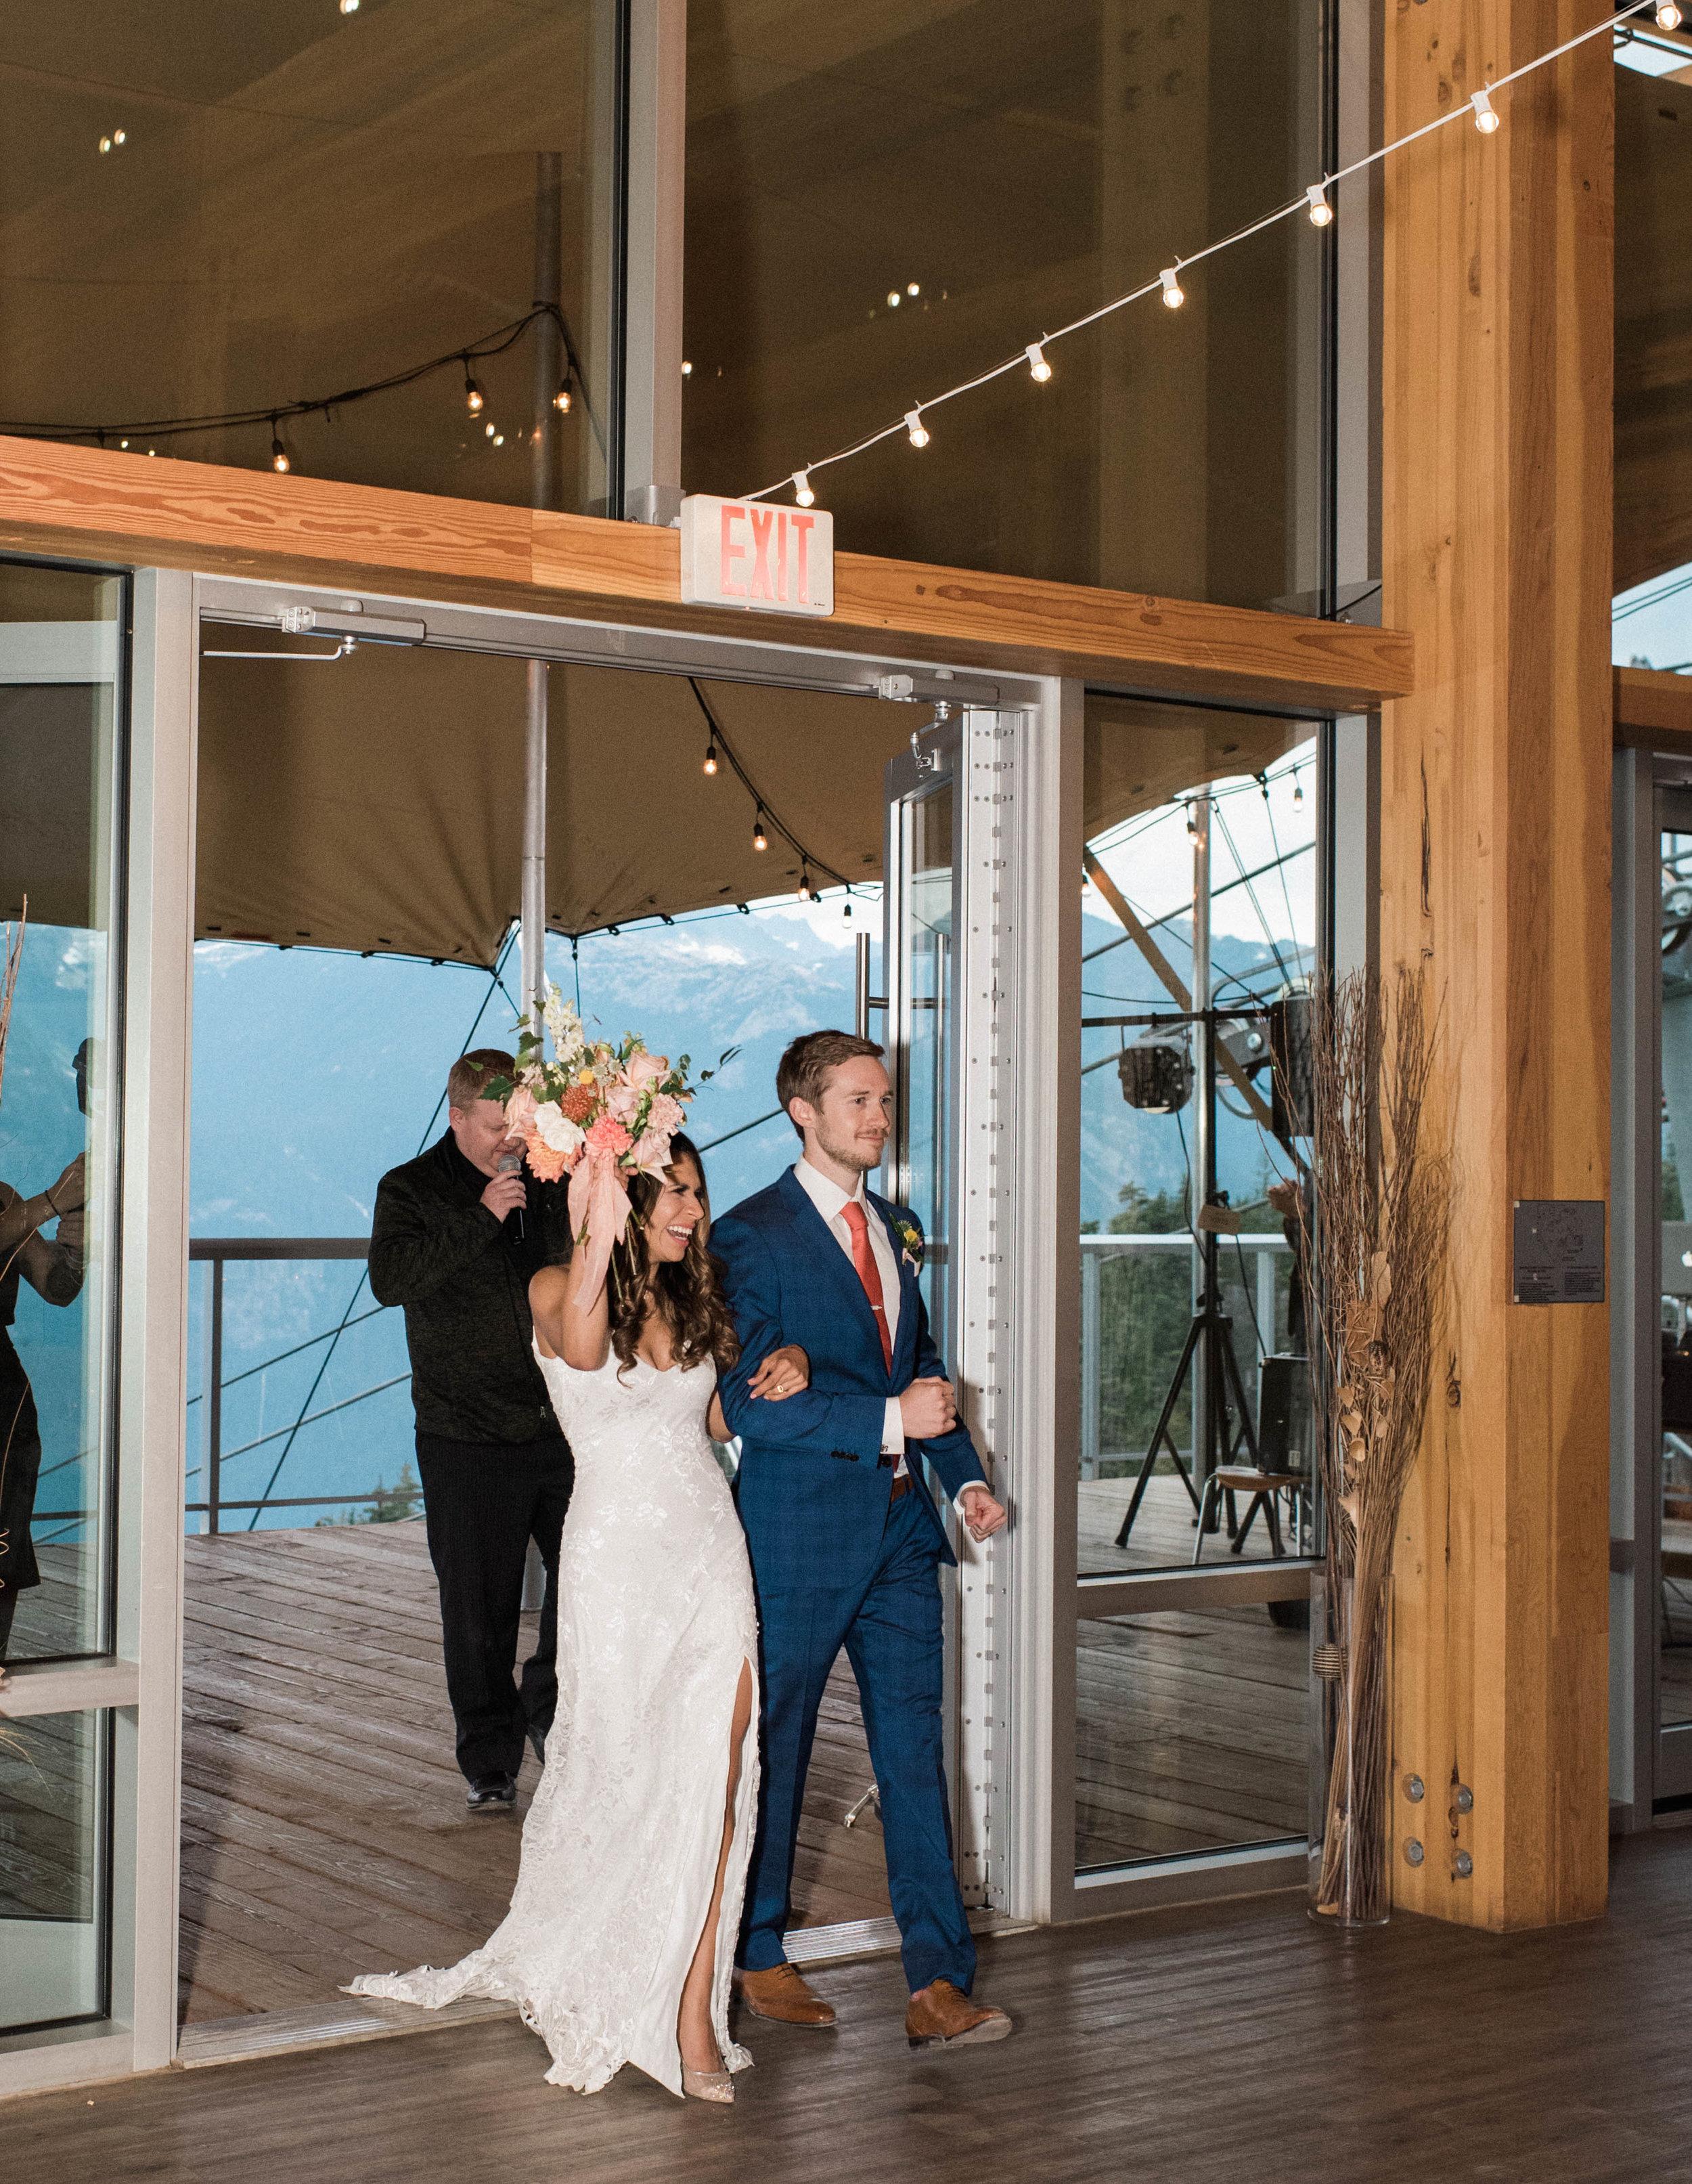 austin-texas-wedding-photography-1778-photographie-104.jpg